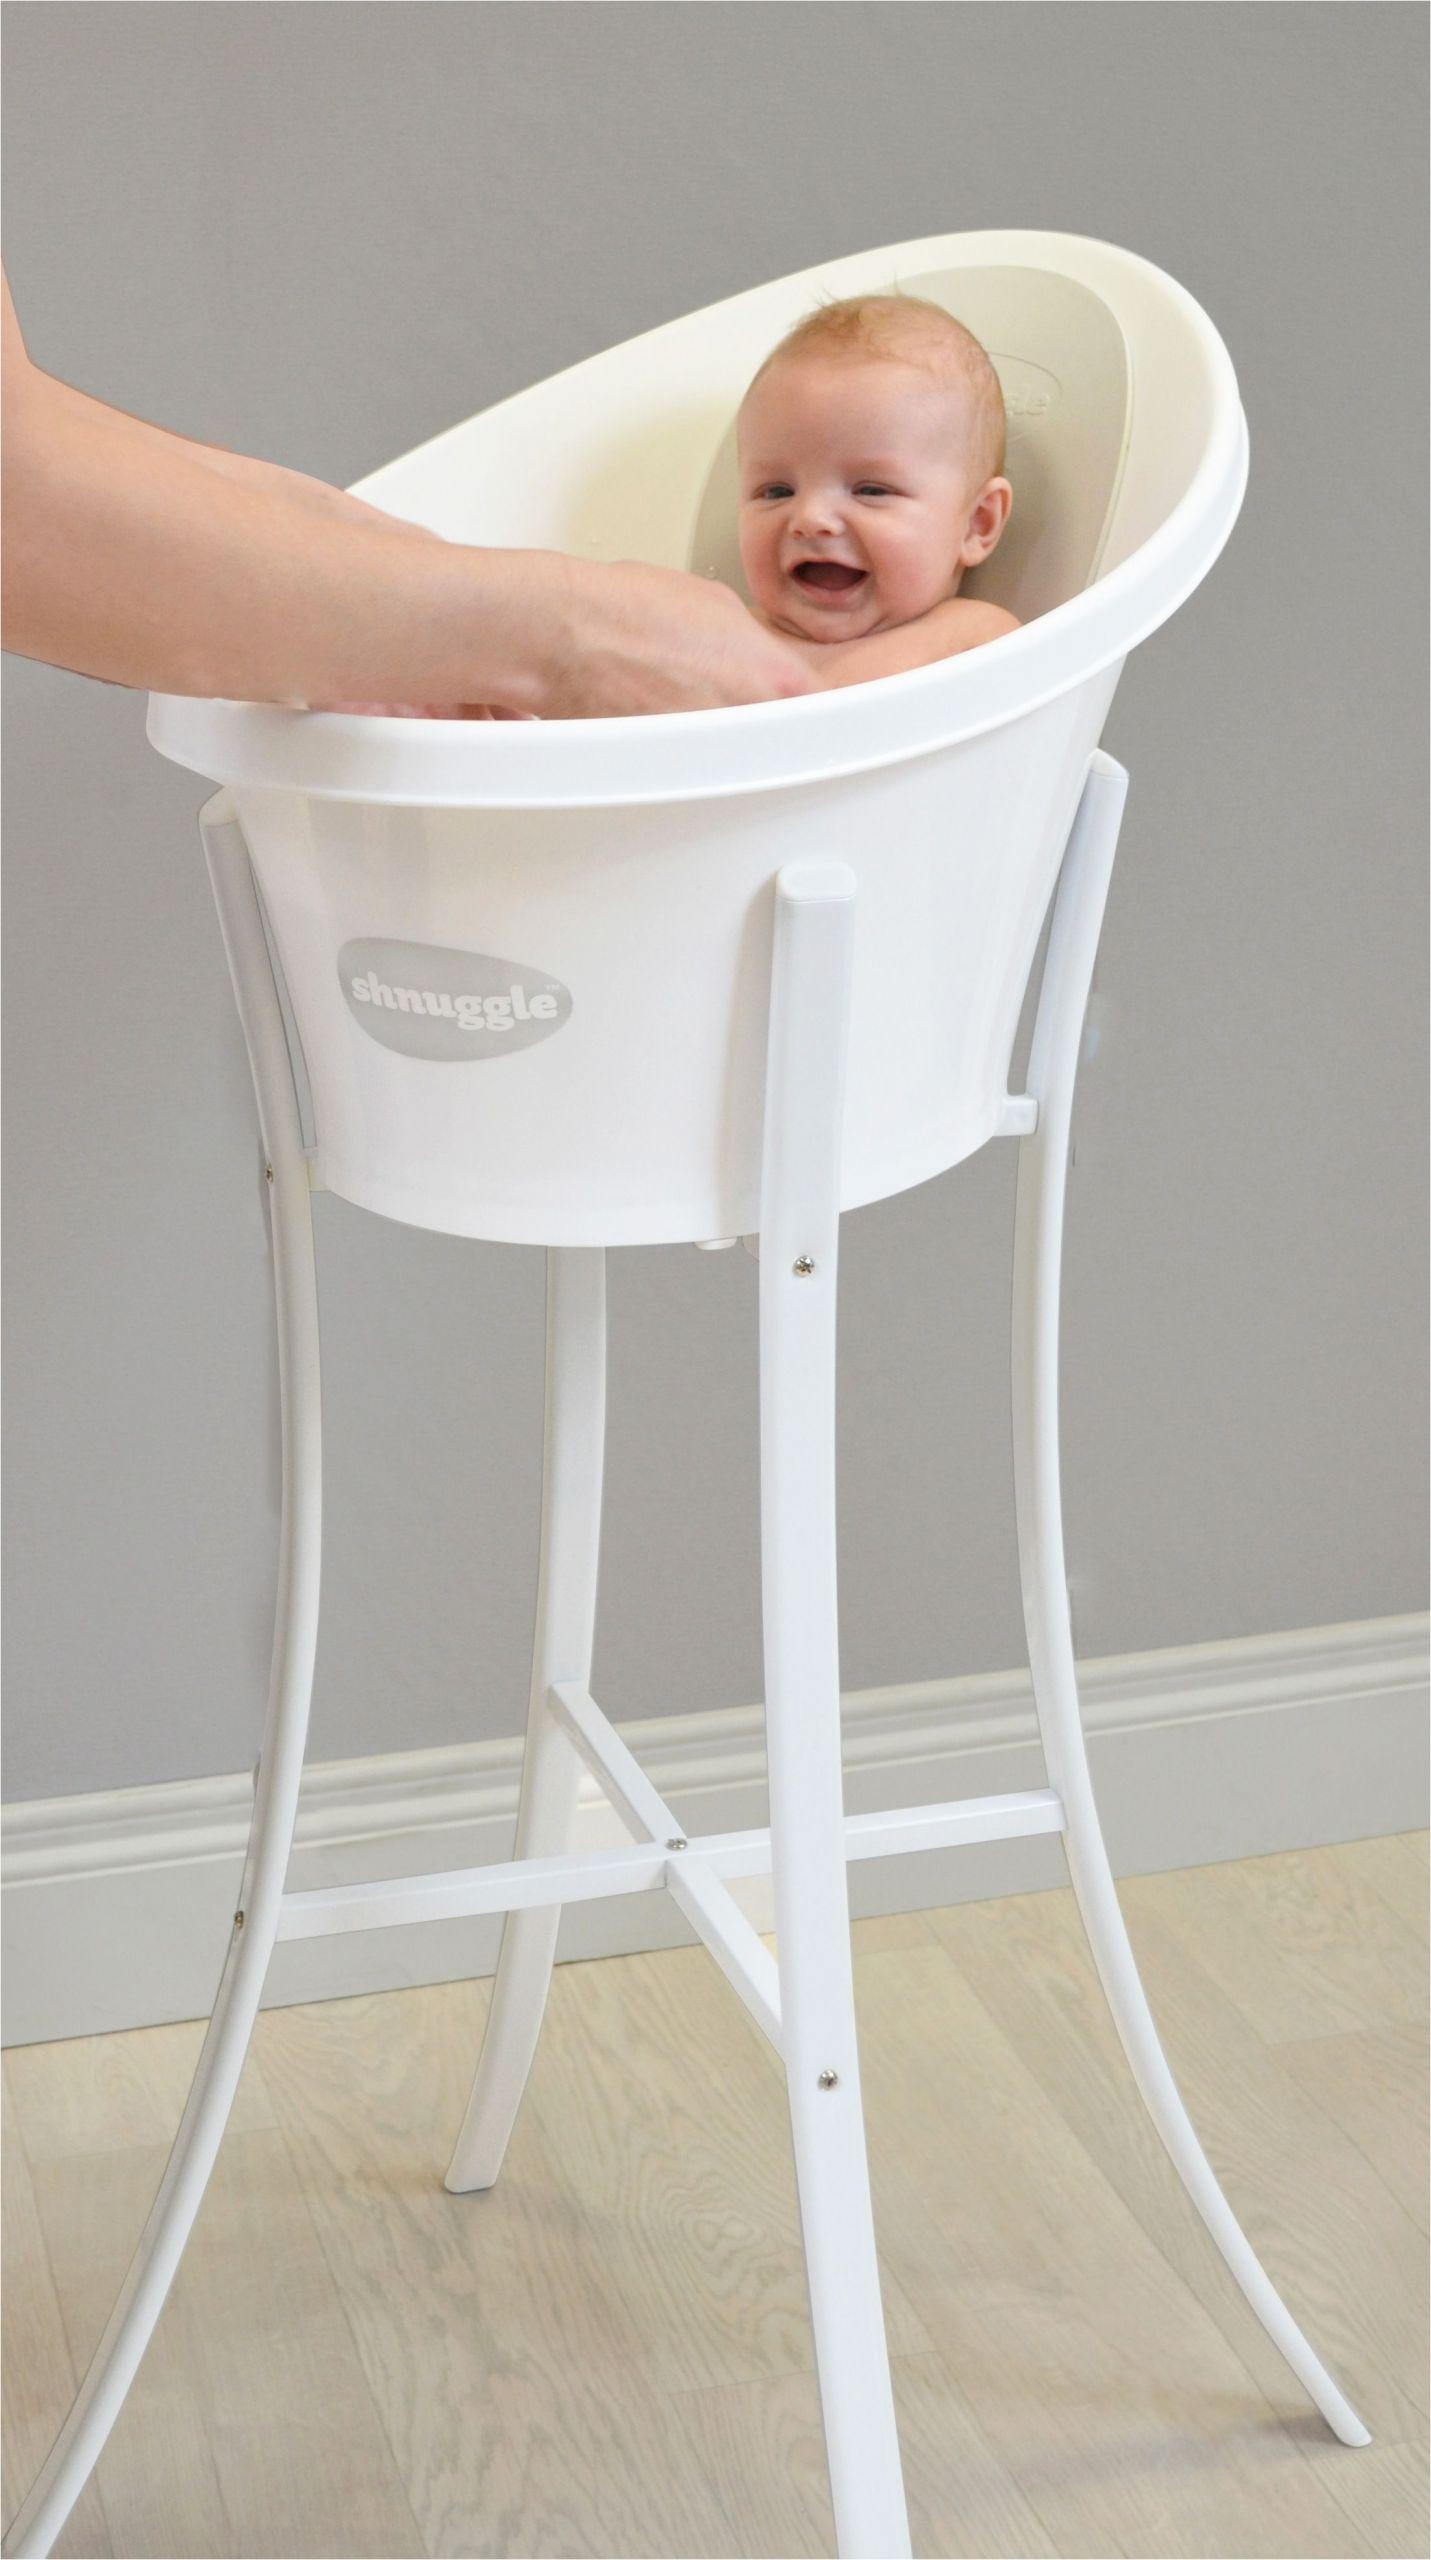 Baby Bath Tub with Stand India Shnuggle Bath Grey Backrest and Stand Baby Boy